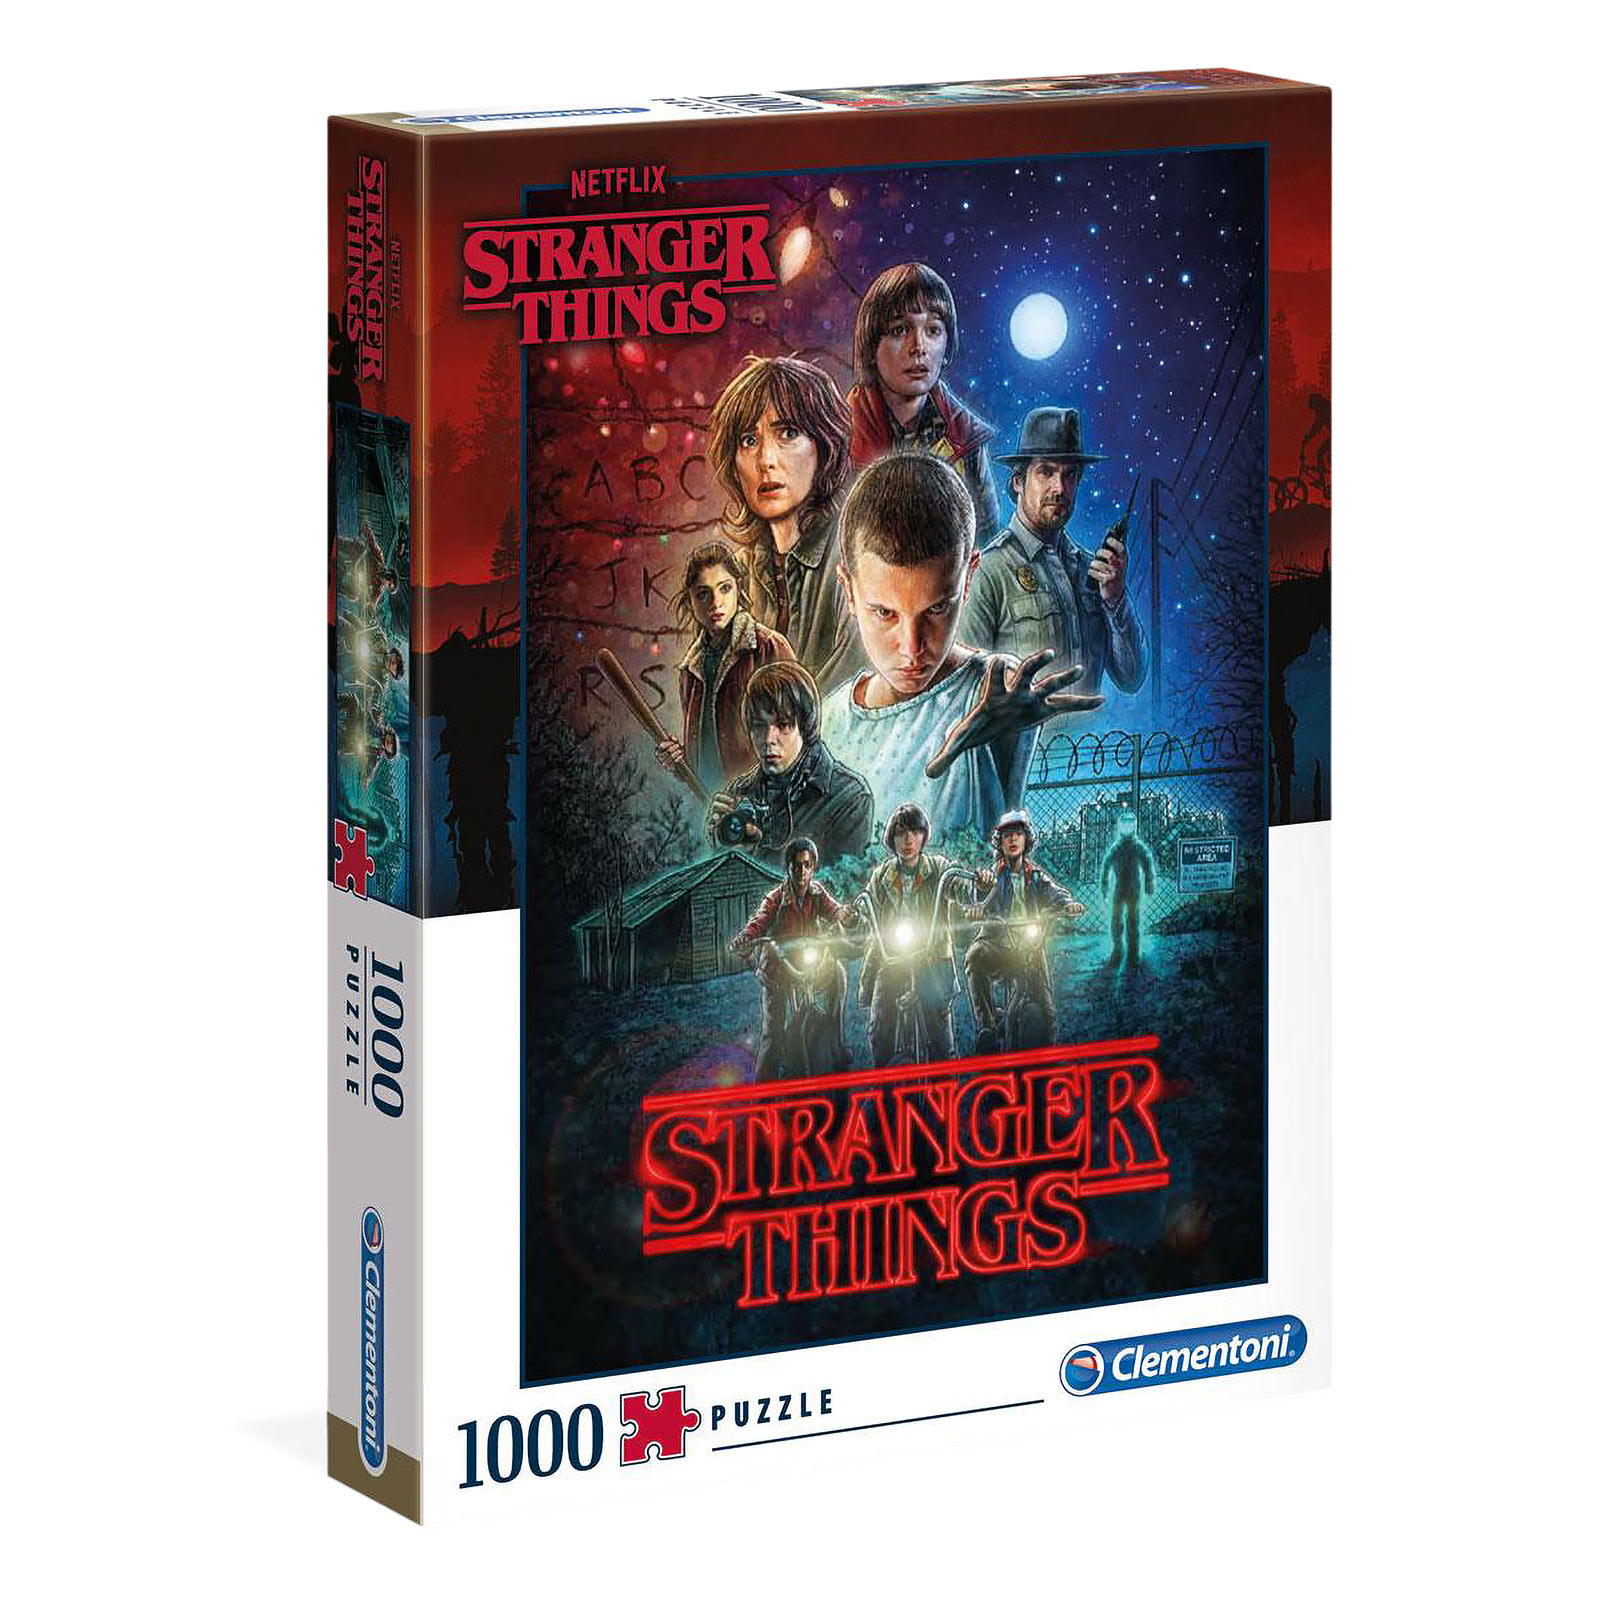 Stranger Things - Season 1 Puzzle